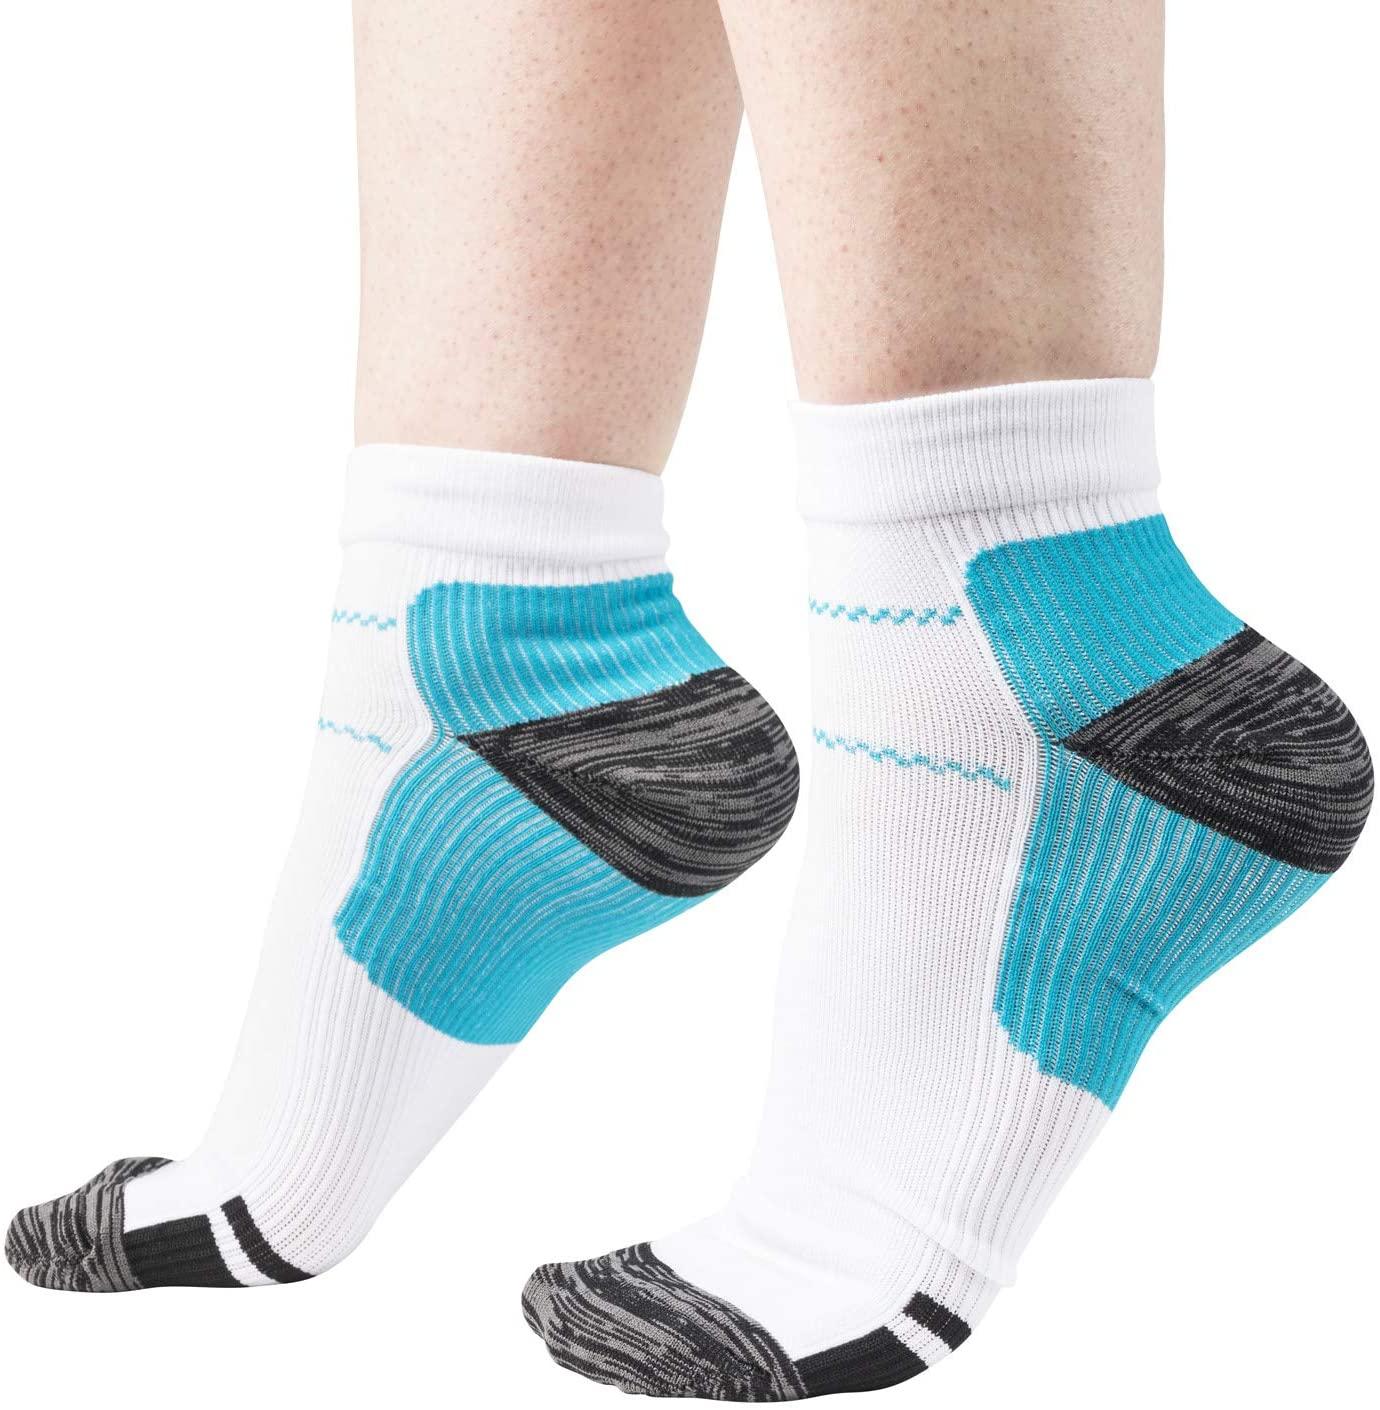 Low-Cut Plantar Fasciitis Socks for Men and Women, Heel Pain Support (2 Pairs)